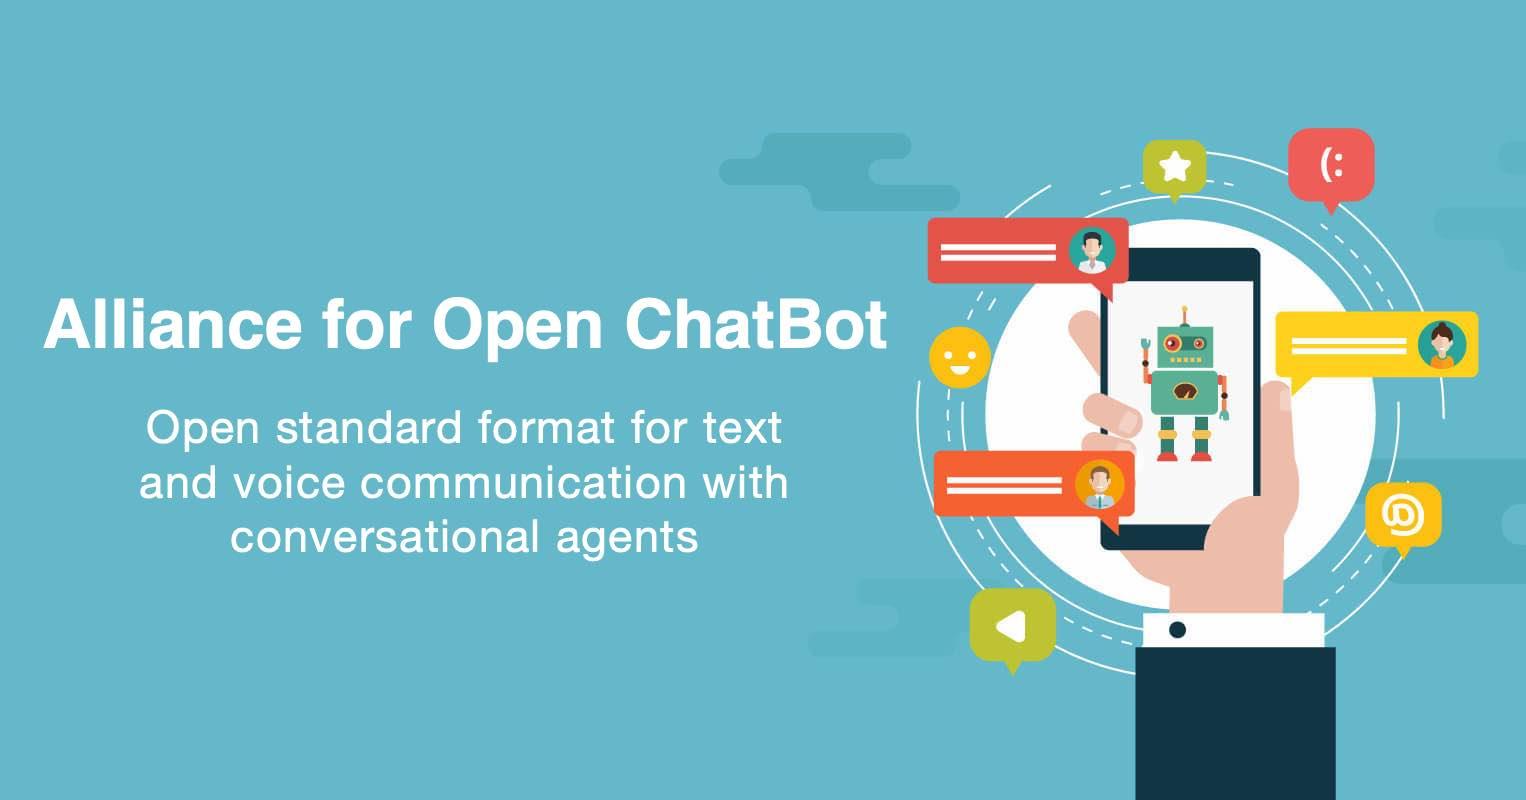 Alliance for Open ChatBot header